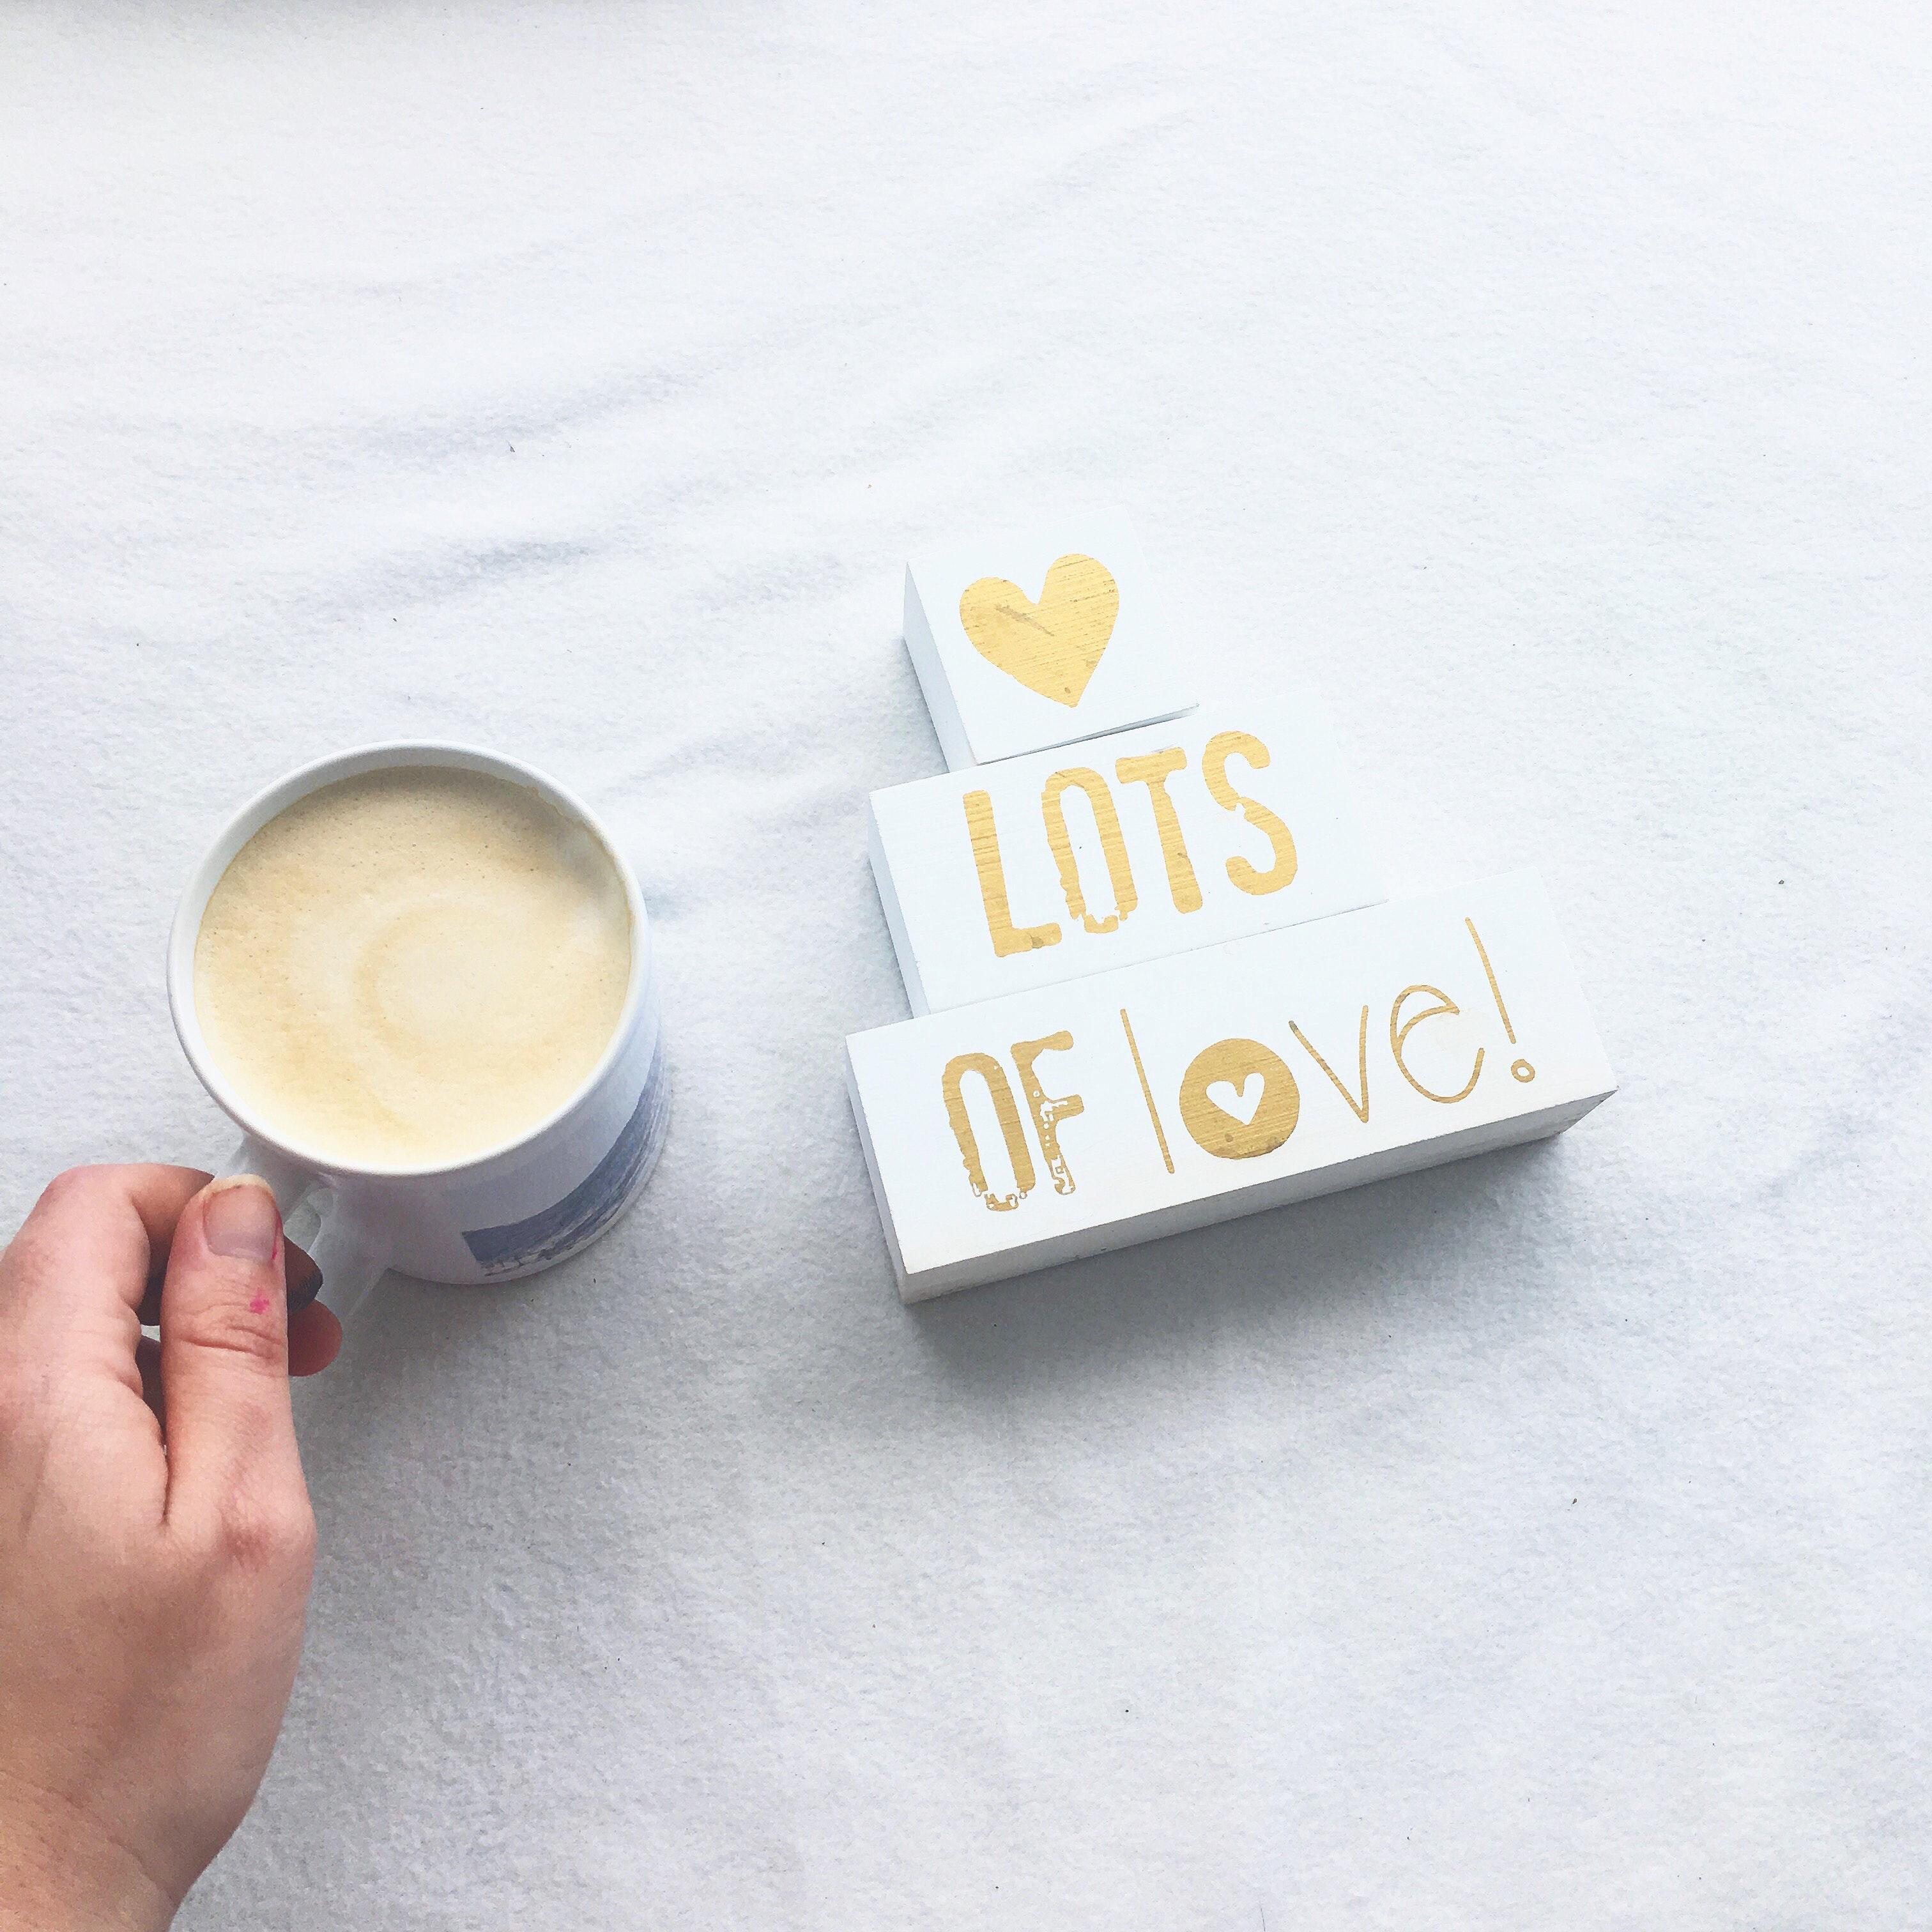 Person holding white ceramic coffee mug photo